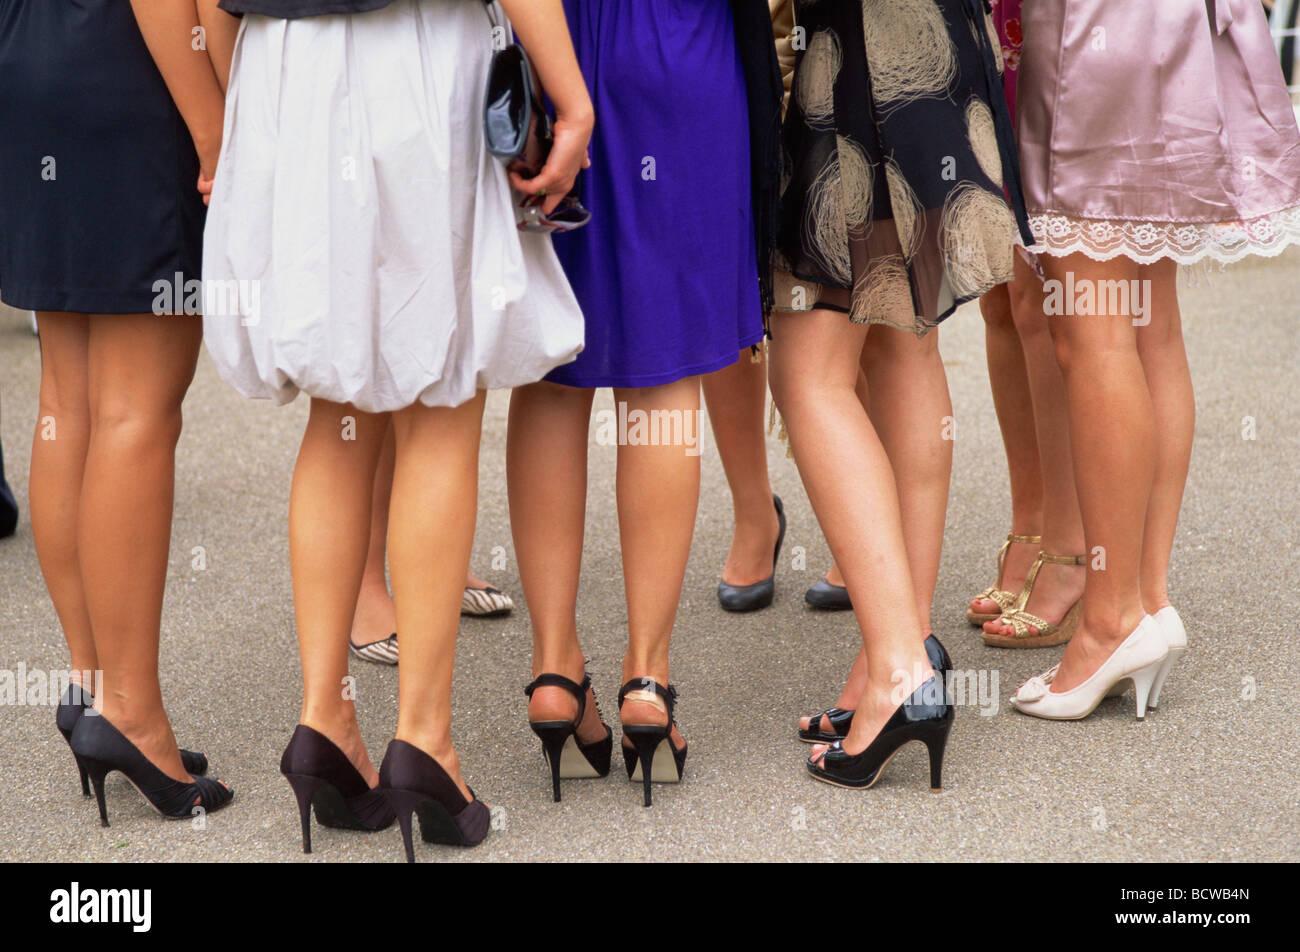 Legs of a group of women in a racecourse, Ascot Racecourse, Ascot, England - Stock Image